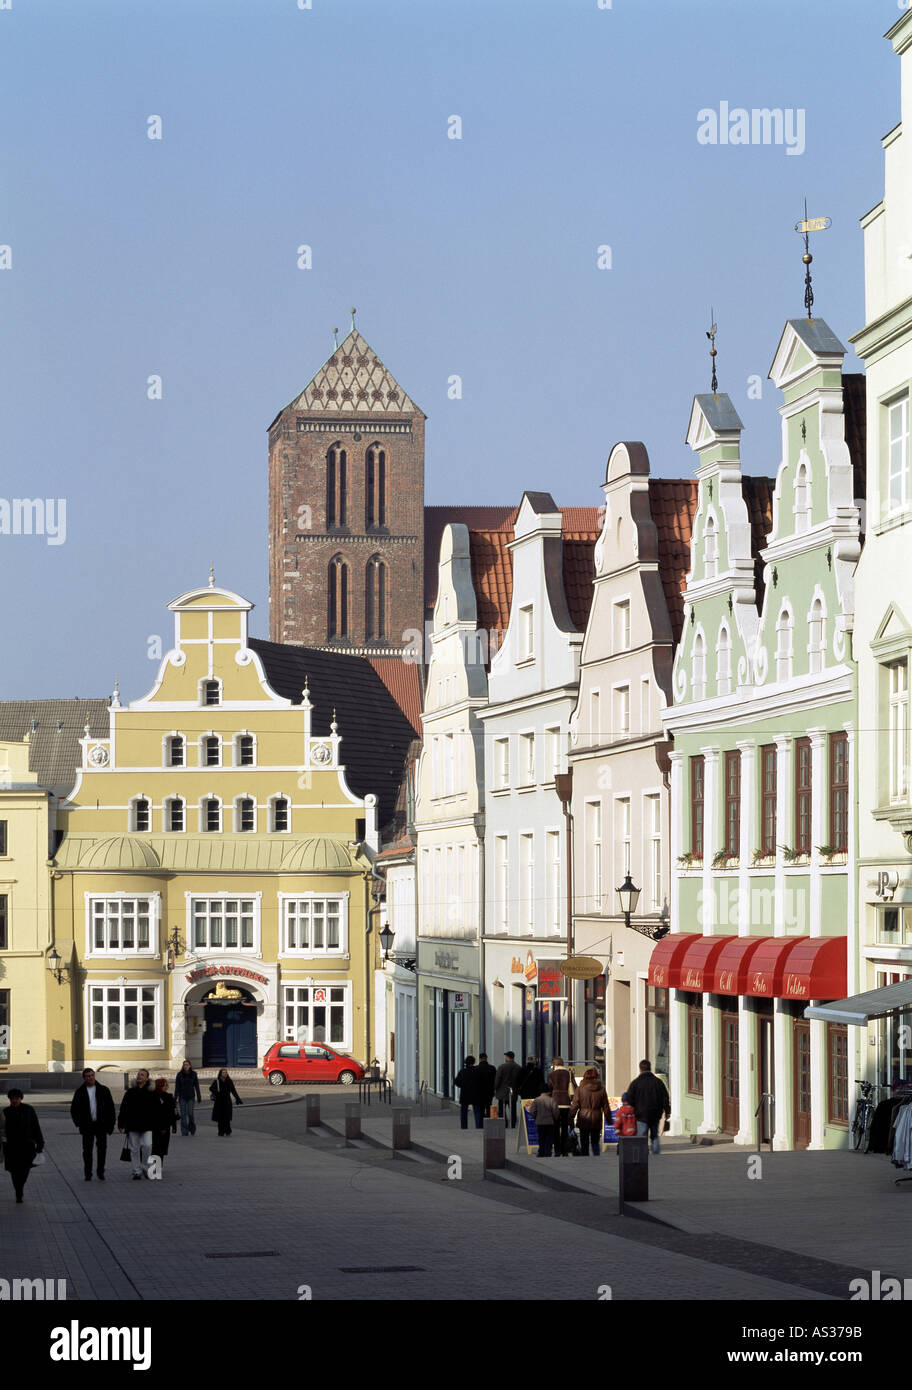 Wismar, Krämerstraße mit Nikolaikirche, Häuserfront - Stock Image